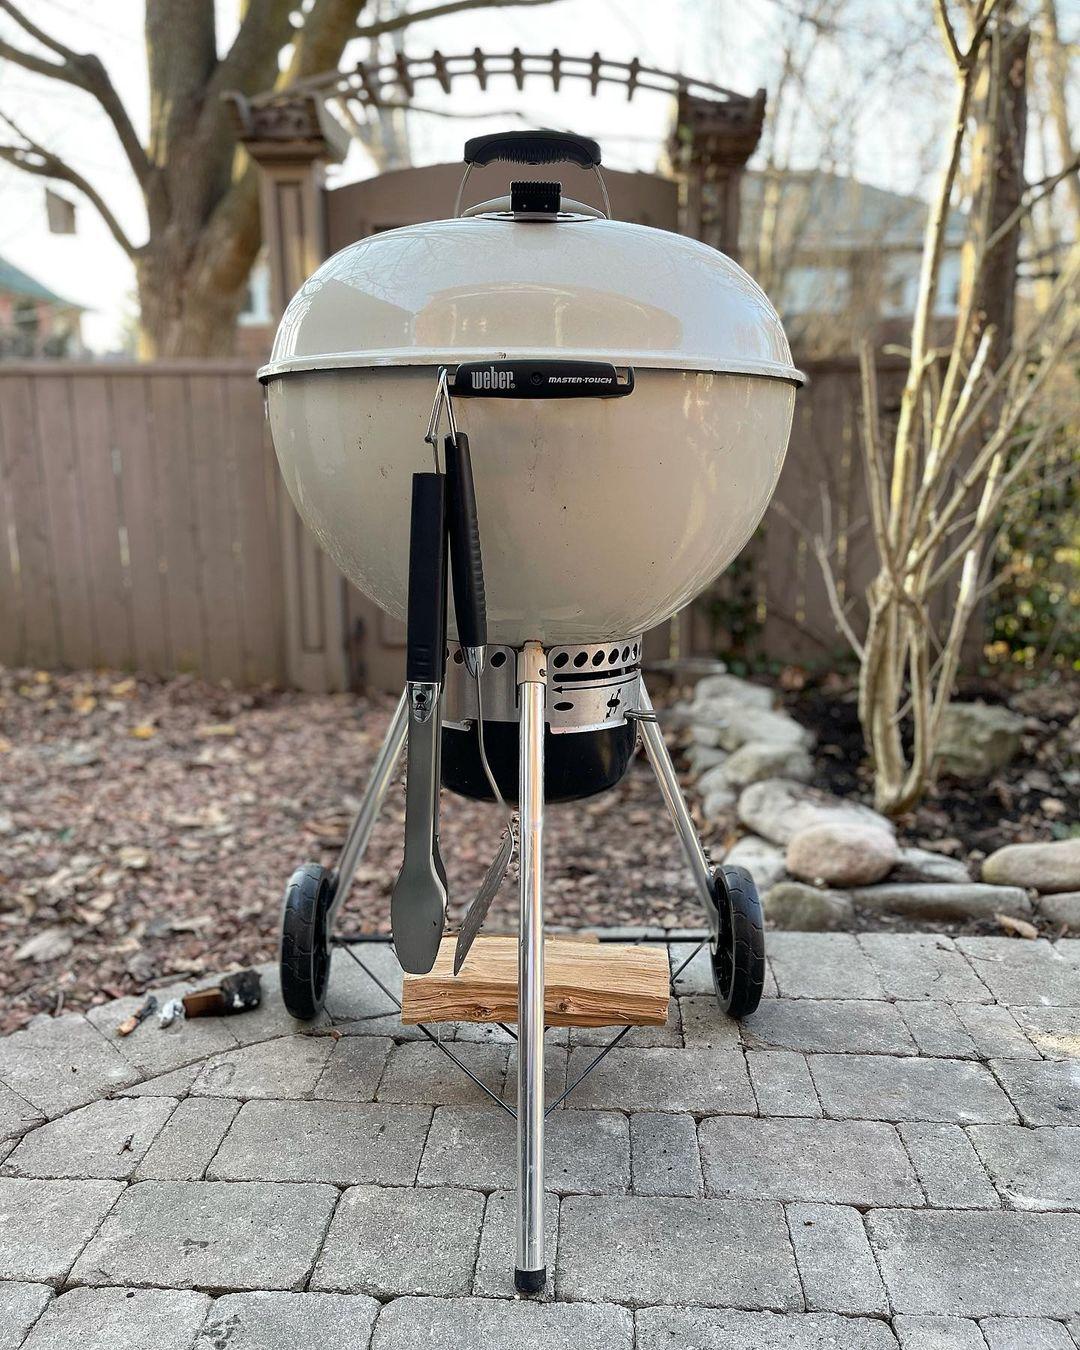 indoor bbq grills singapore - weber original kettle charcoal grill